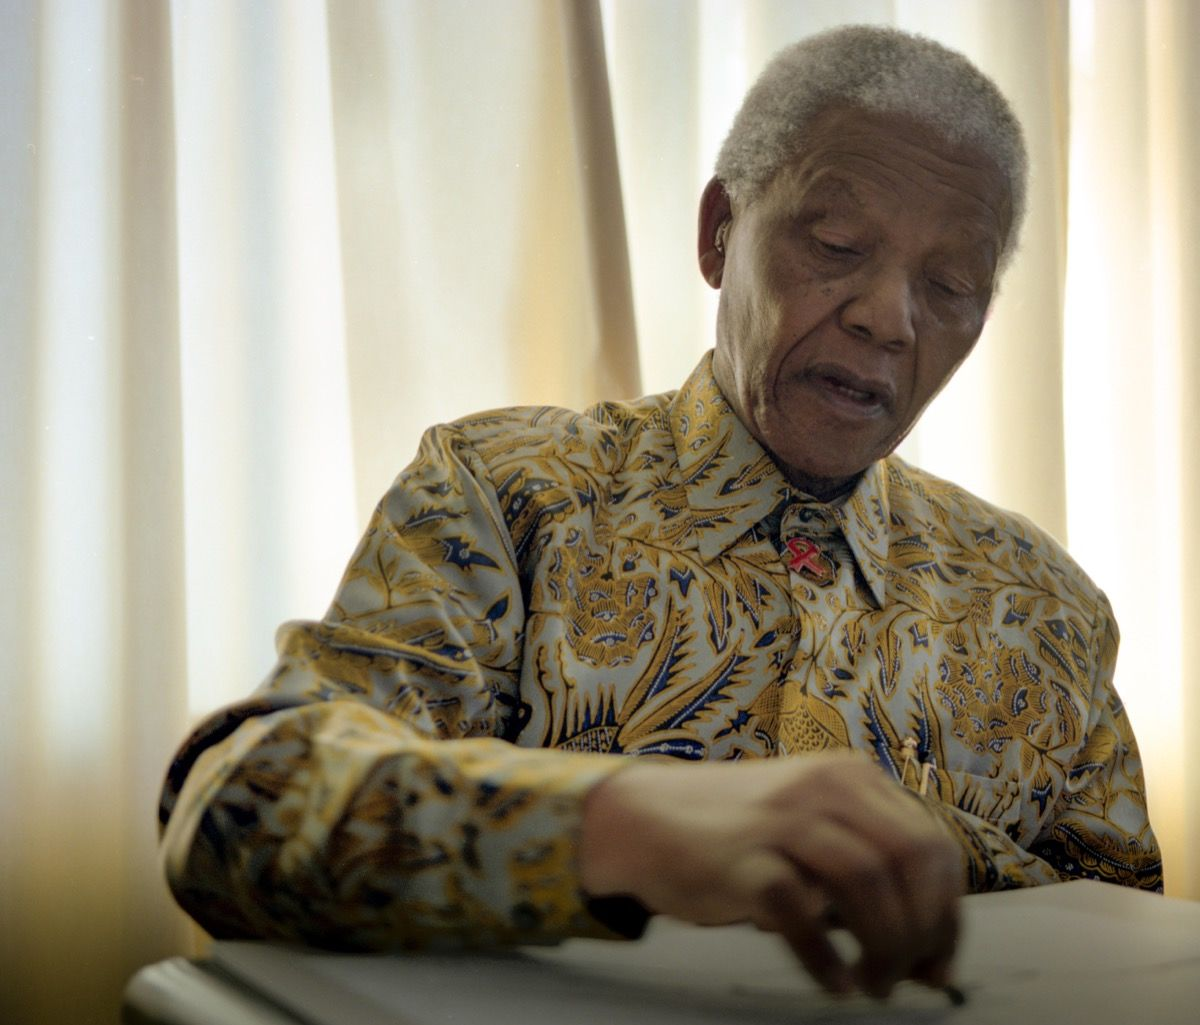 Nelson Mandela drawing, photo by Grant Warren. Courtesy of WeTransfer and The House of Mandela Art (Via Artsy).